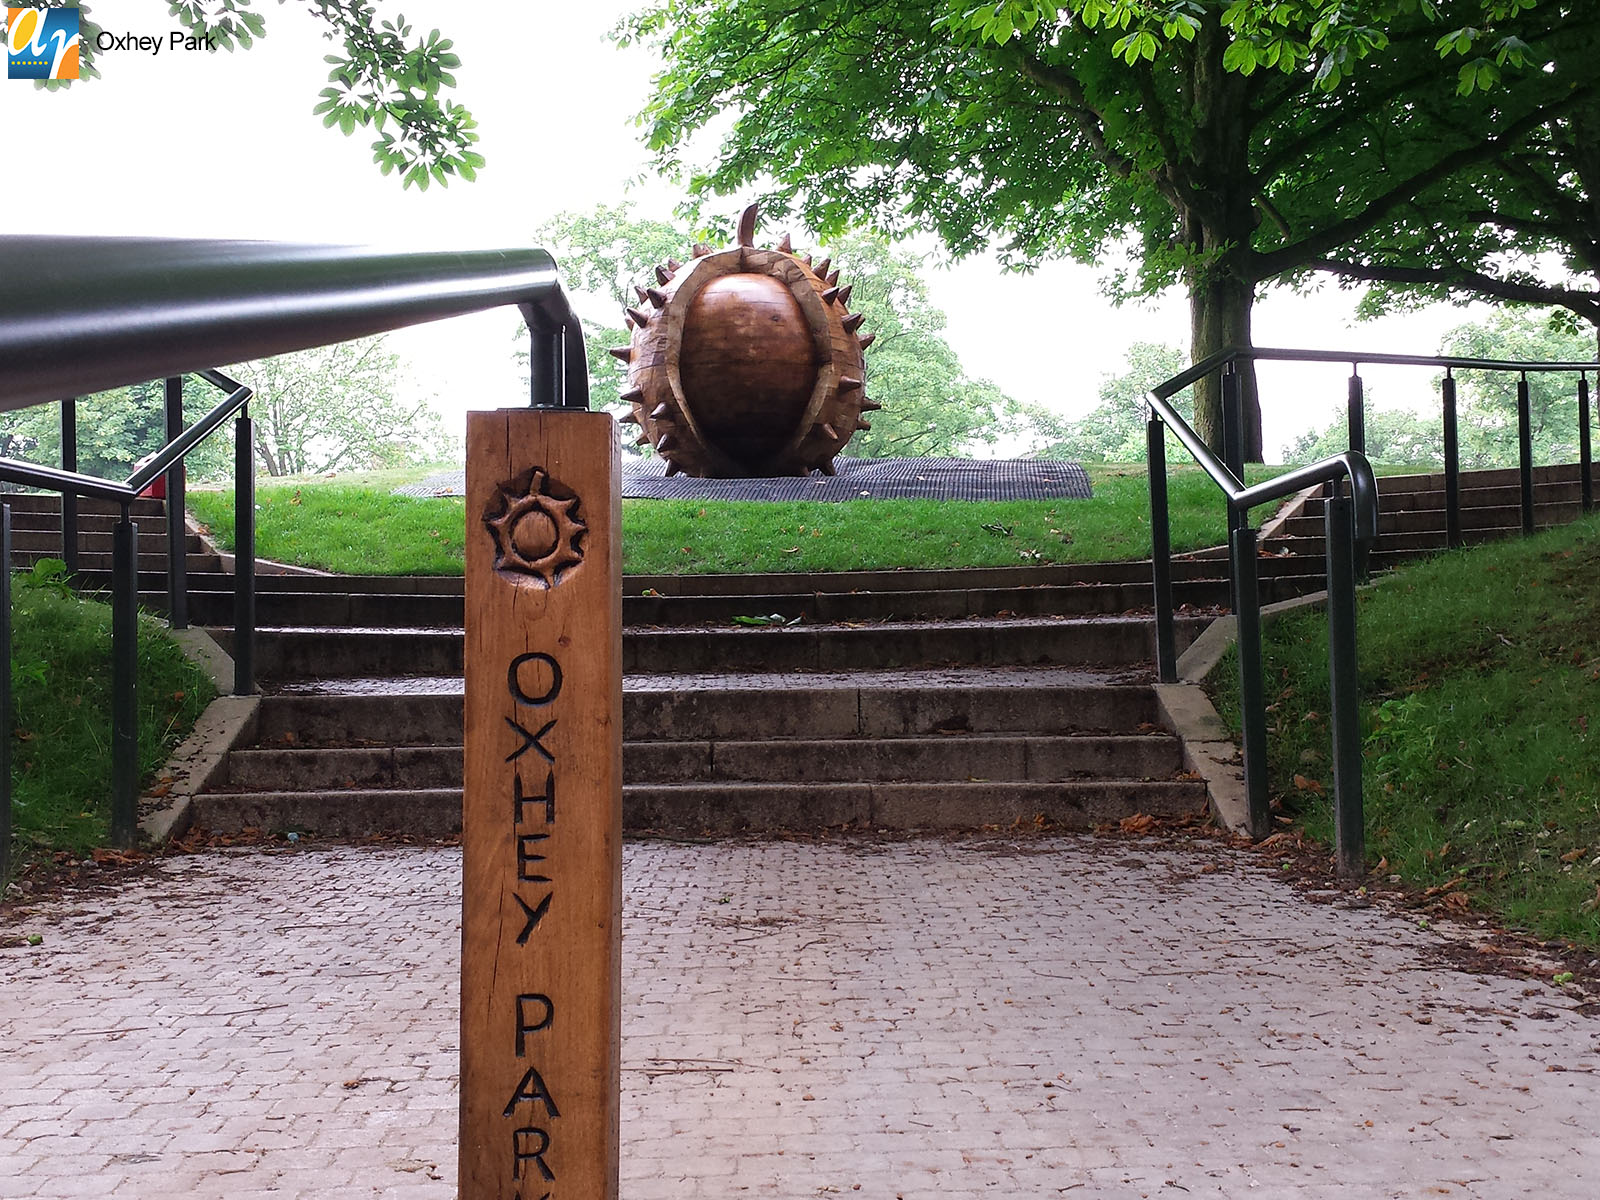 Bespoke metalwork for parks